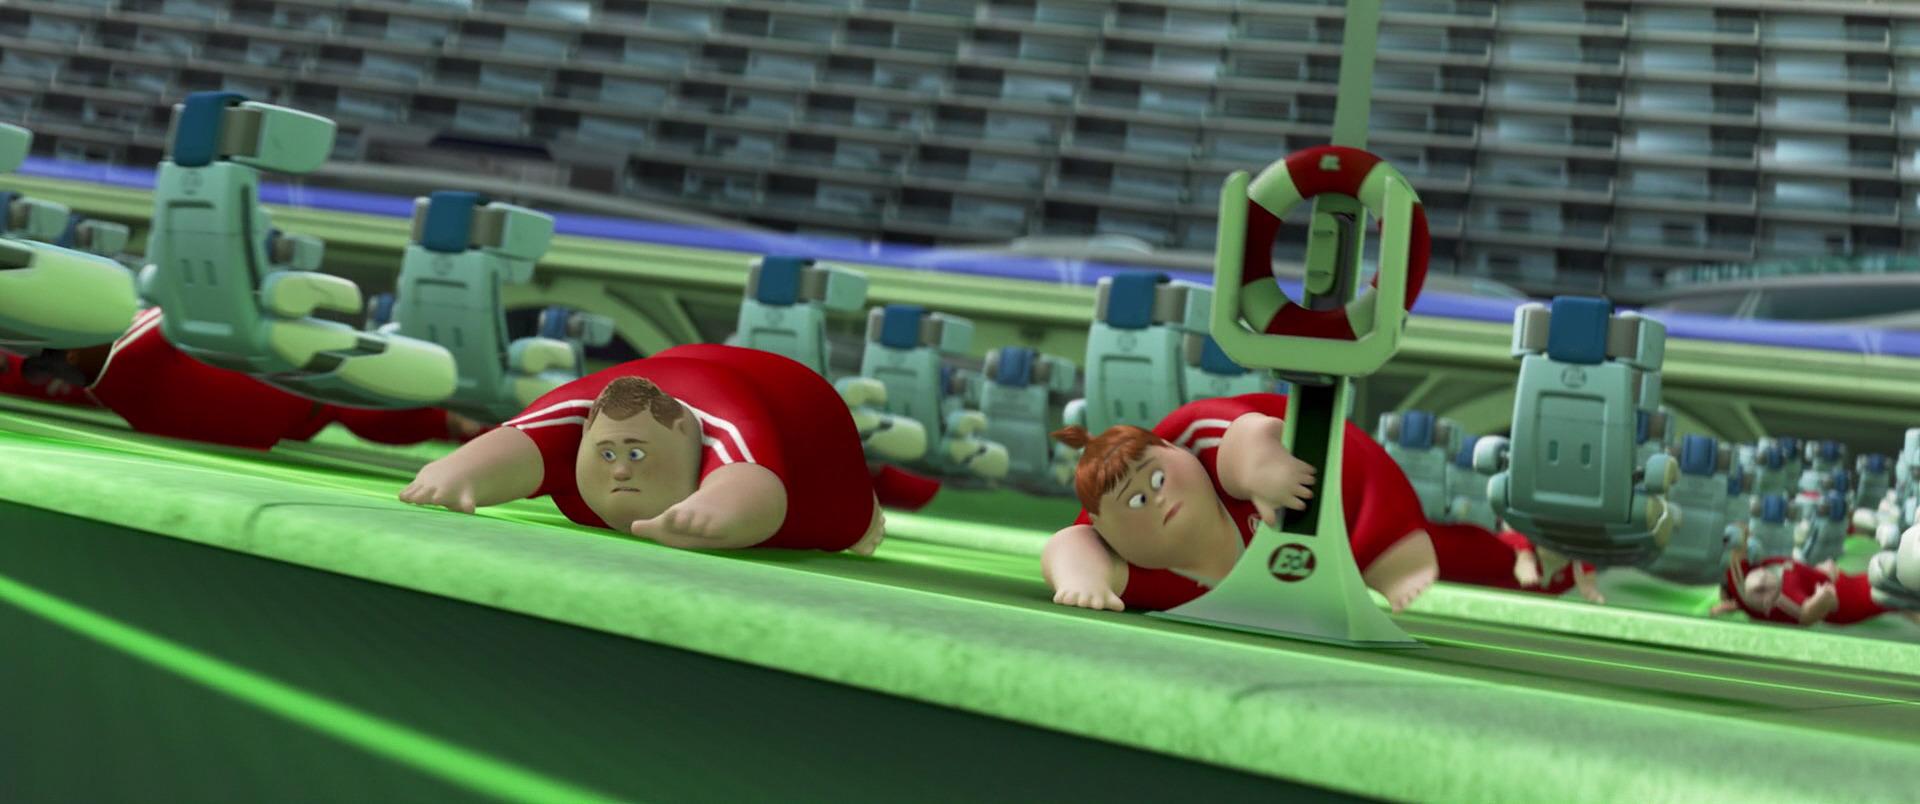 robot maitre nageur lifeguard pixar disney personnage character wall-e